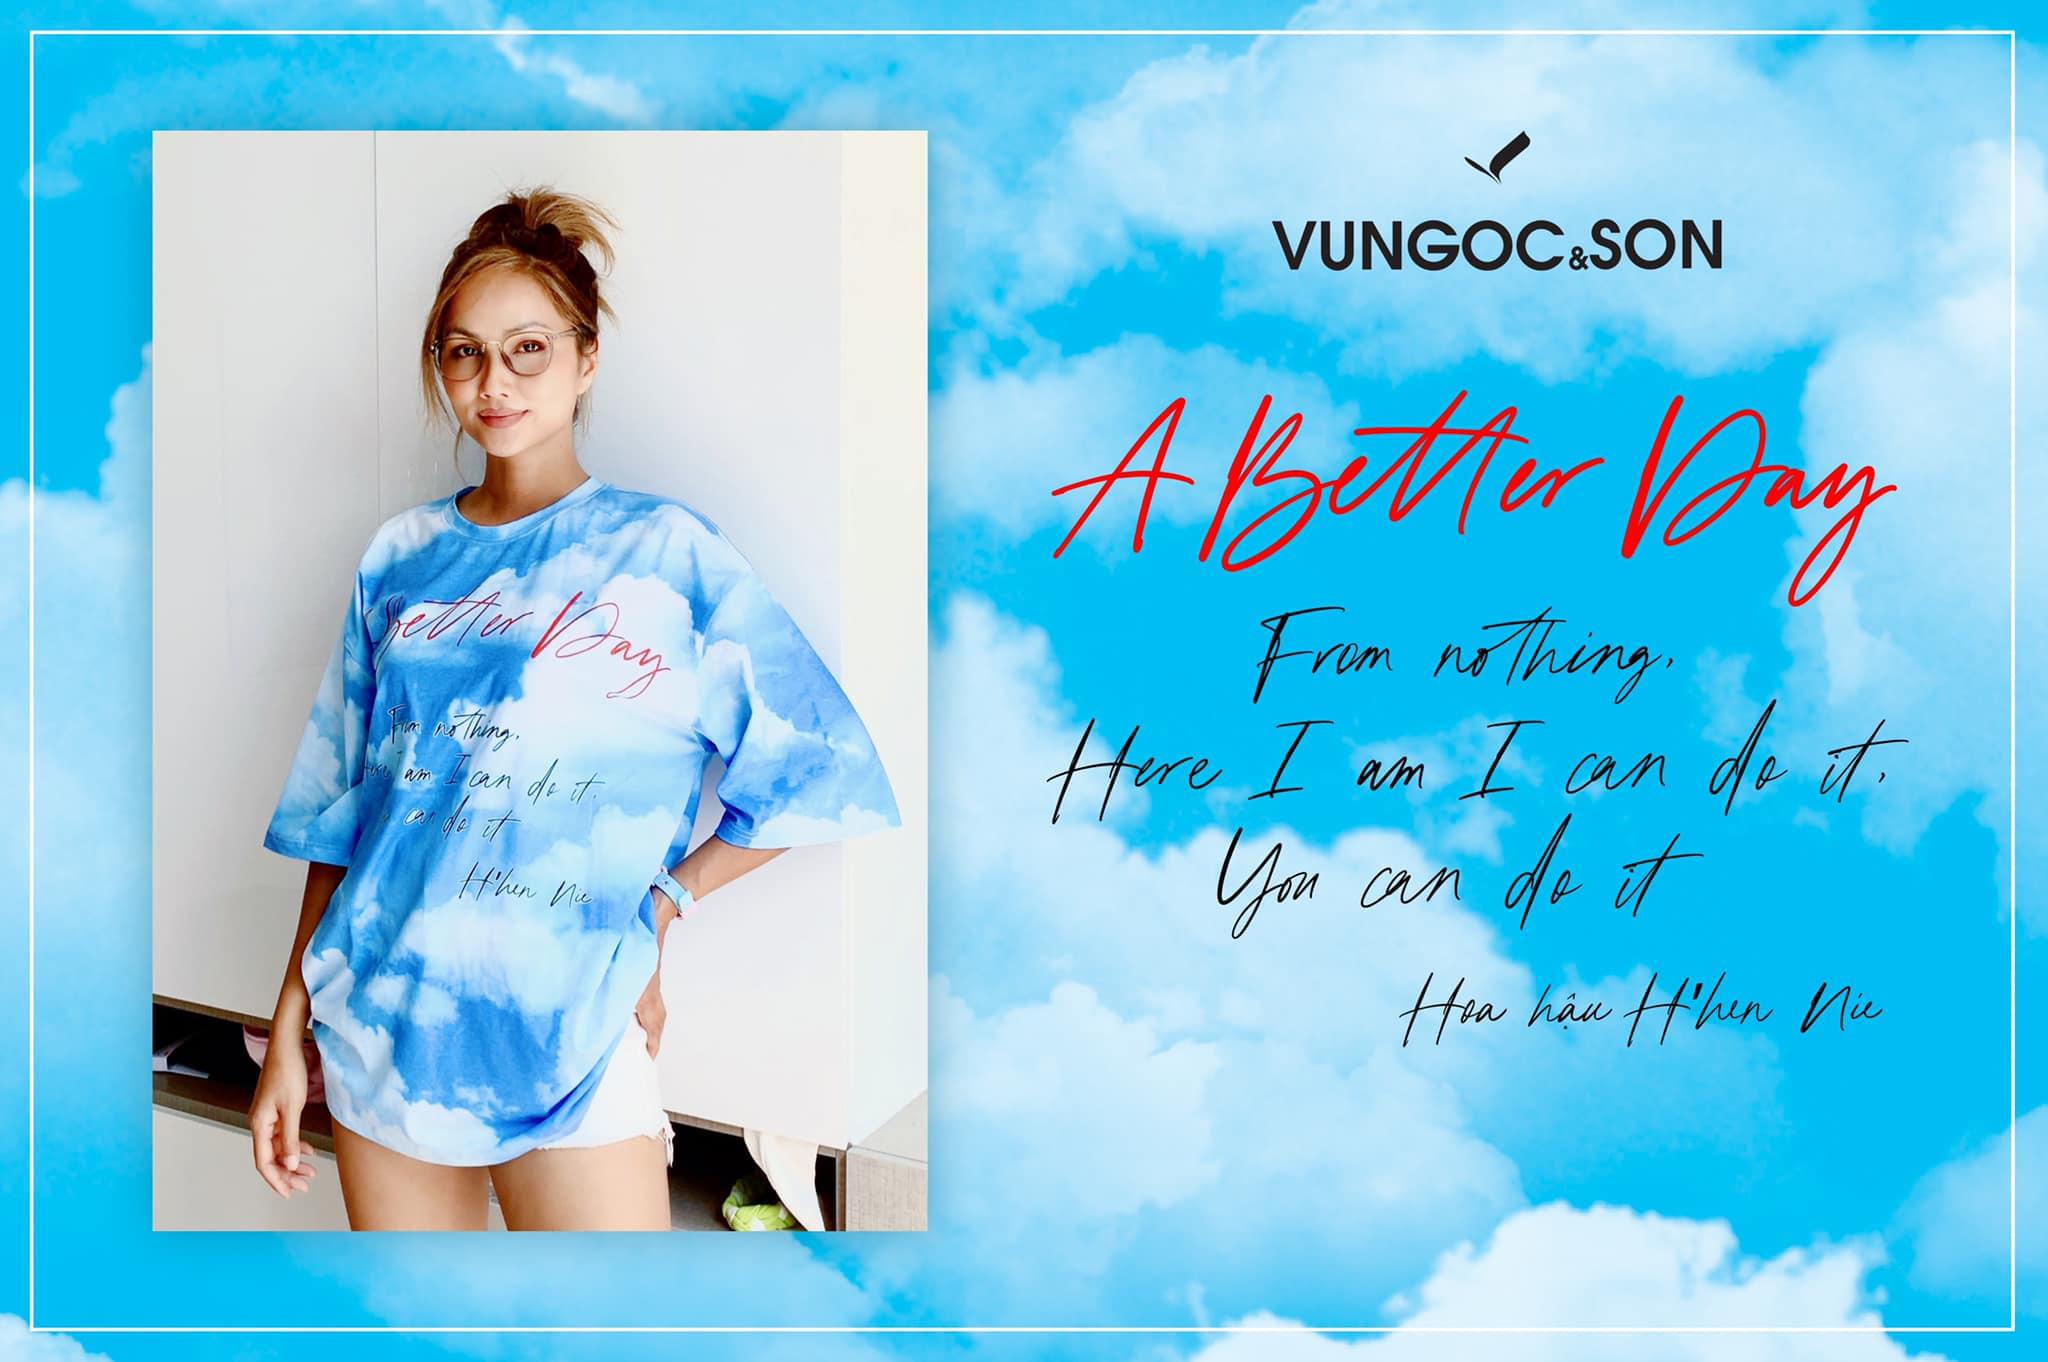 H'Hen Niê tham gia chiến dịch A Better Day VUNGOC&SON